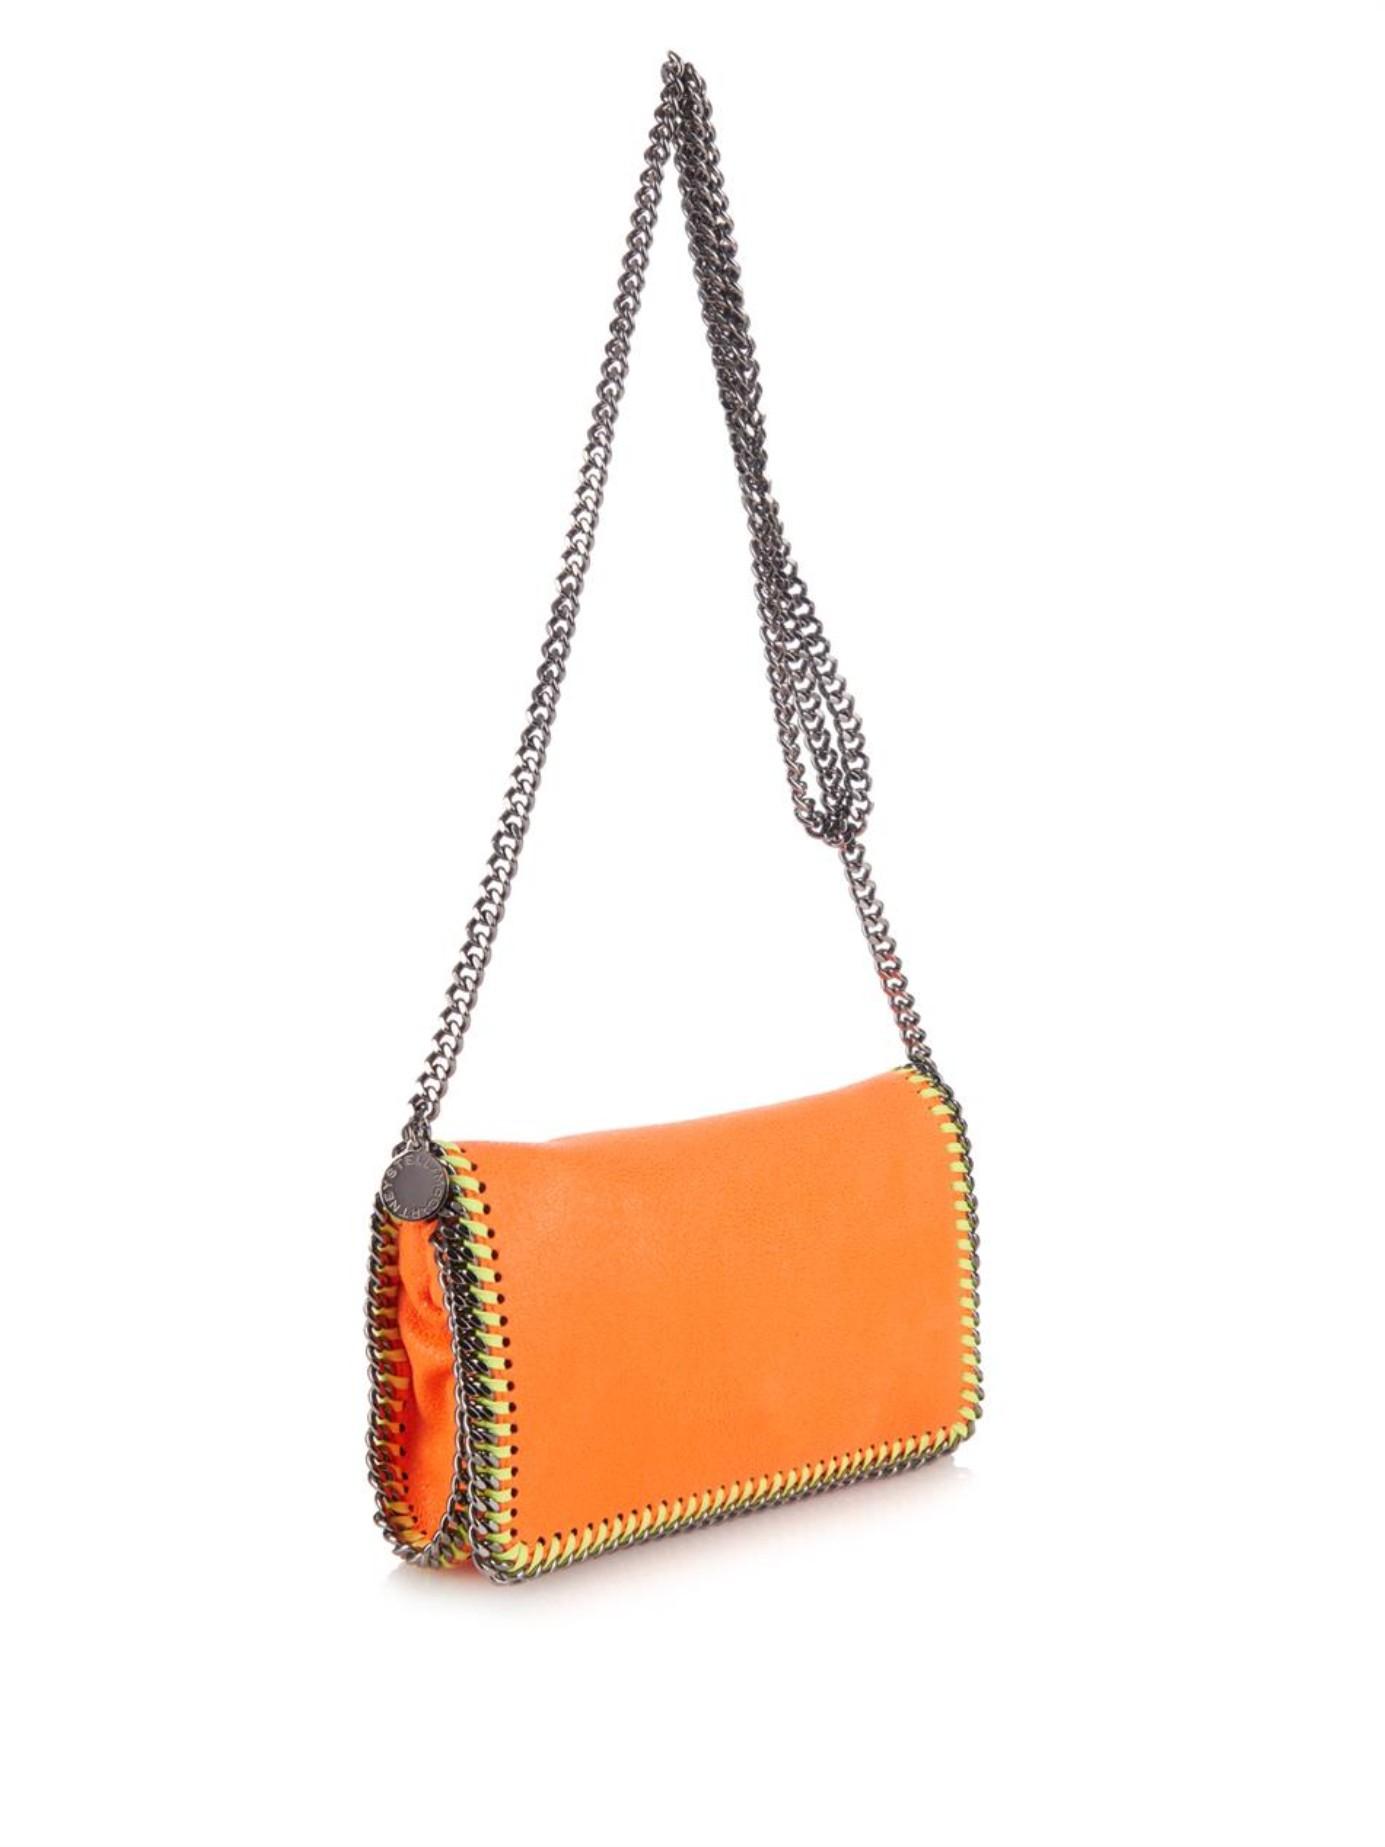 Stella McCartney Falabella Shaggy Deer Cross-Body Bag in Orange